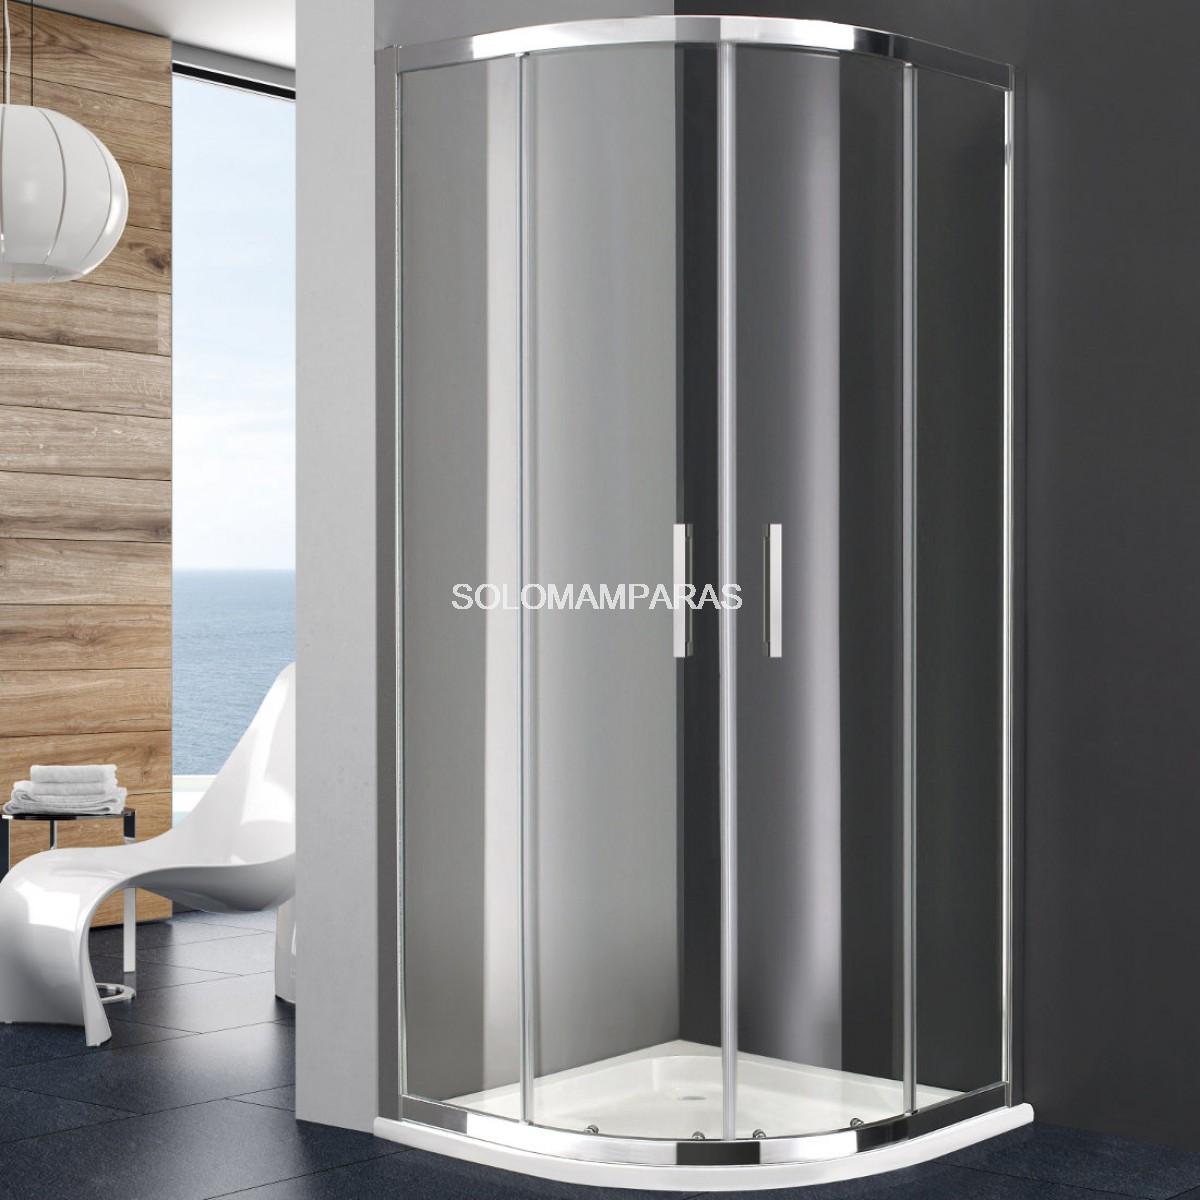 Mampara semicircular de ducha titan - Mamparas de ducha fijas ...